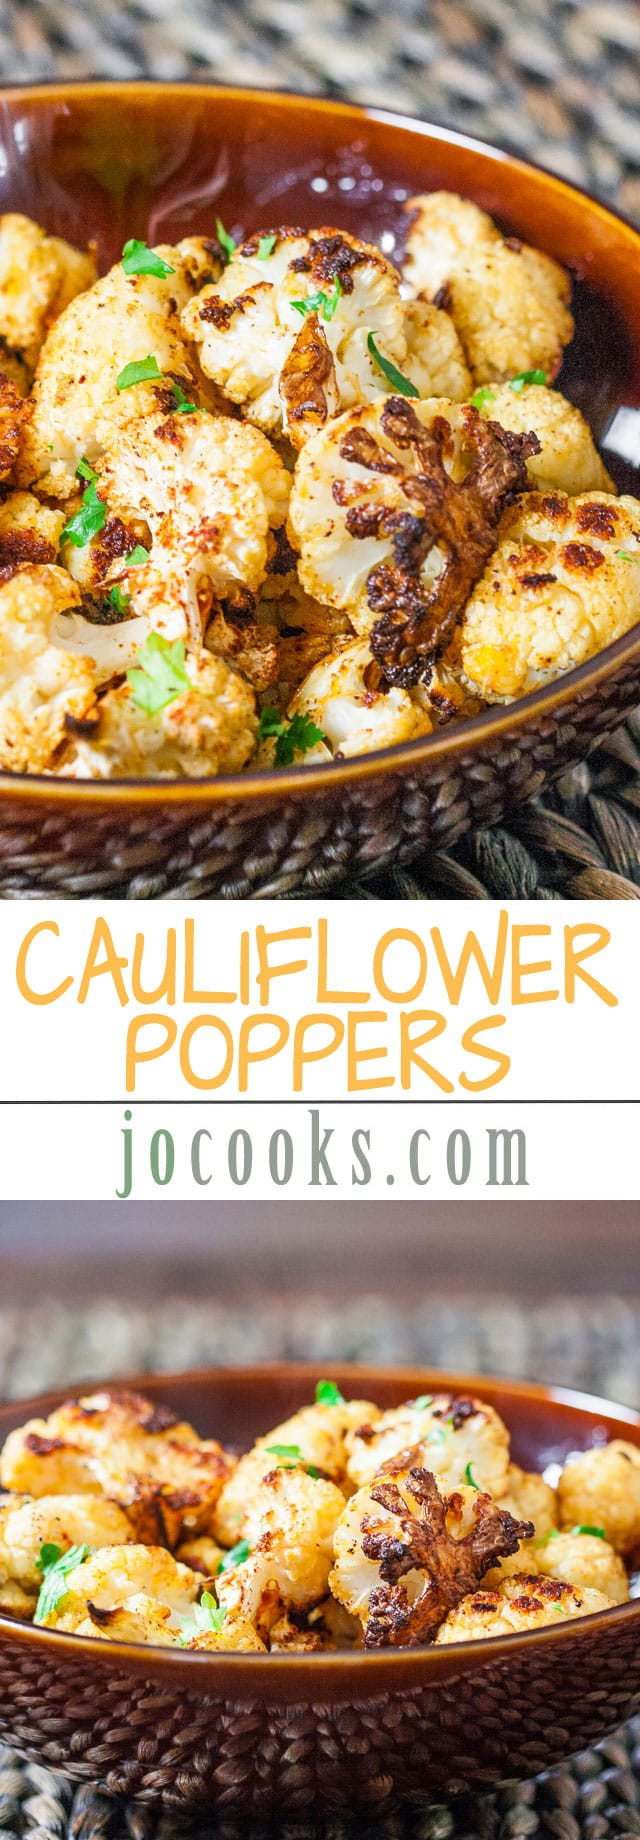 cauliflower-poppers-collage